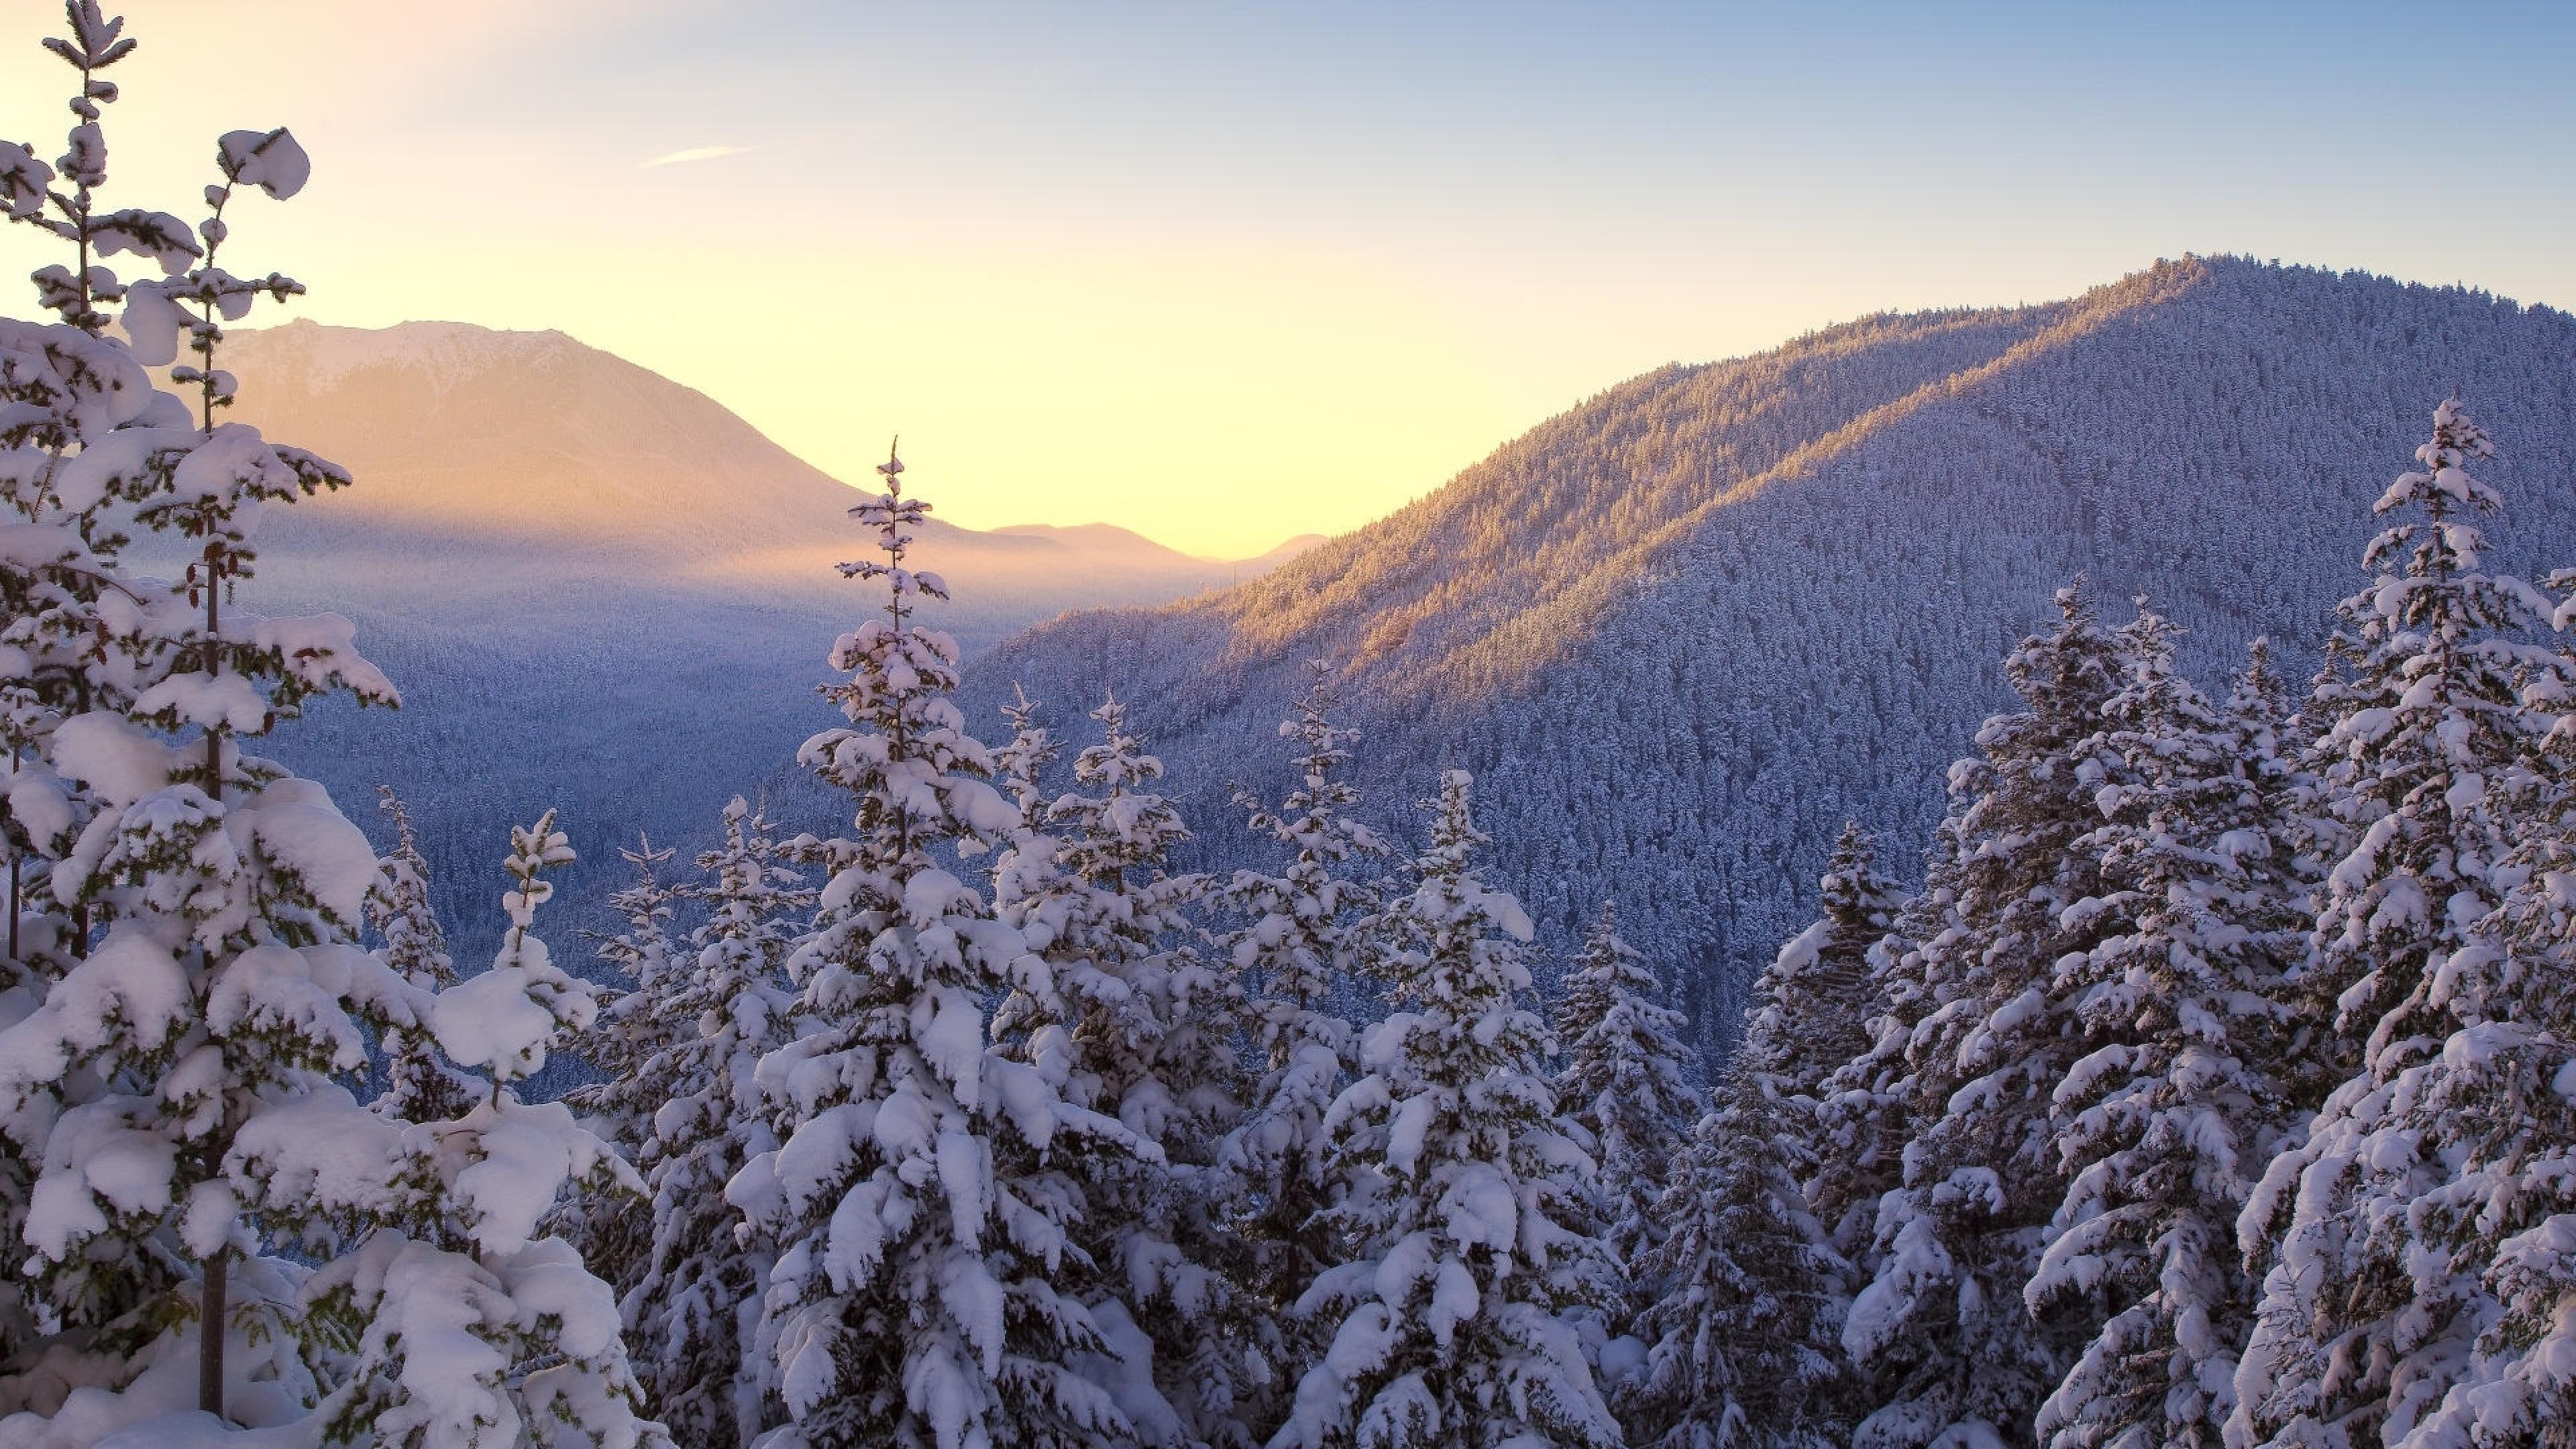 картинки зима мороз, ели, горы, закат, снег, природа, 4к обои